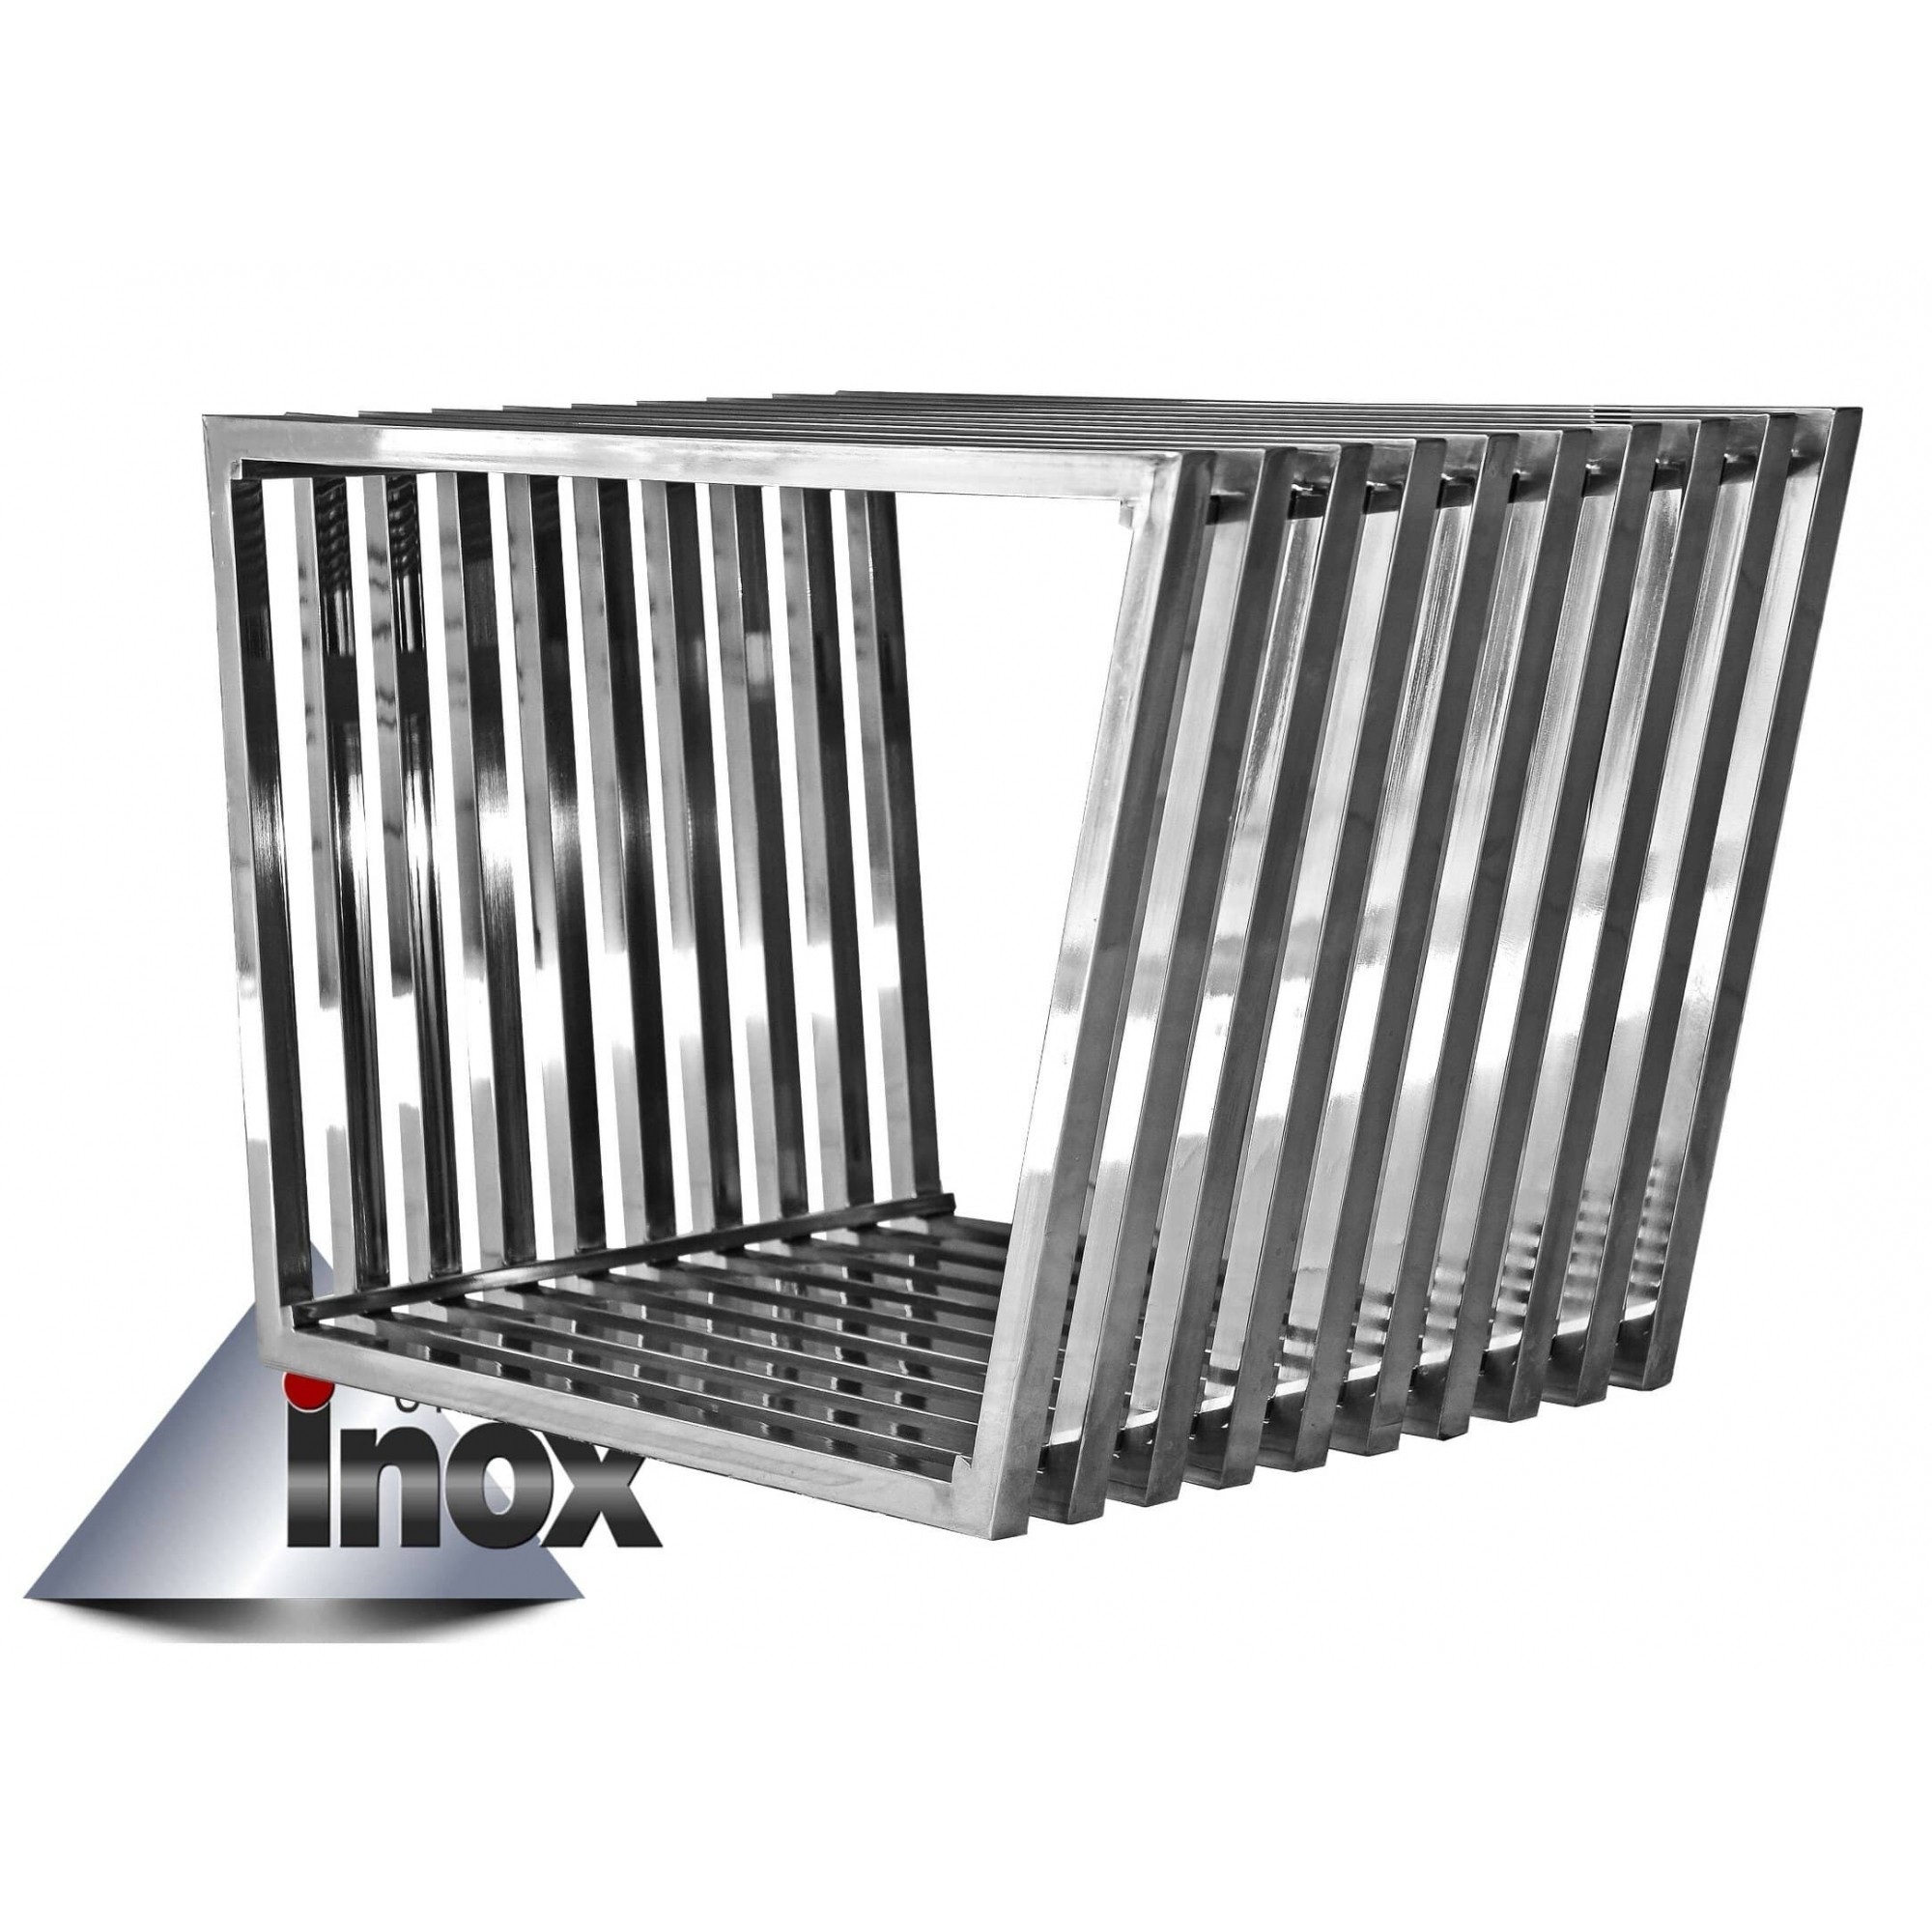 Banco gradeado confeccionado em aço inox